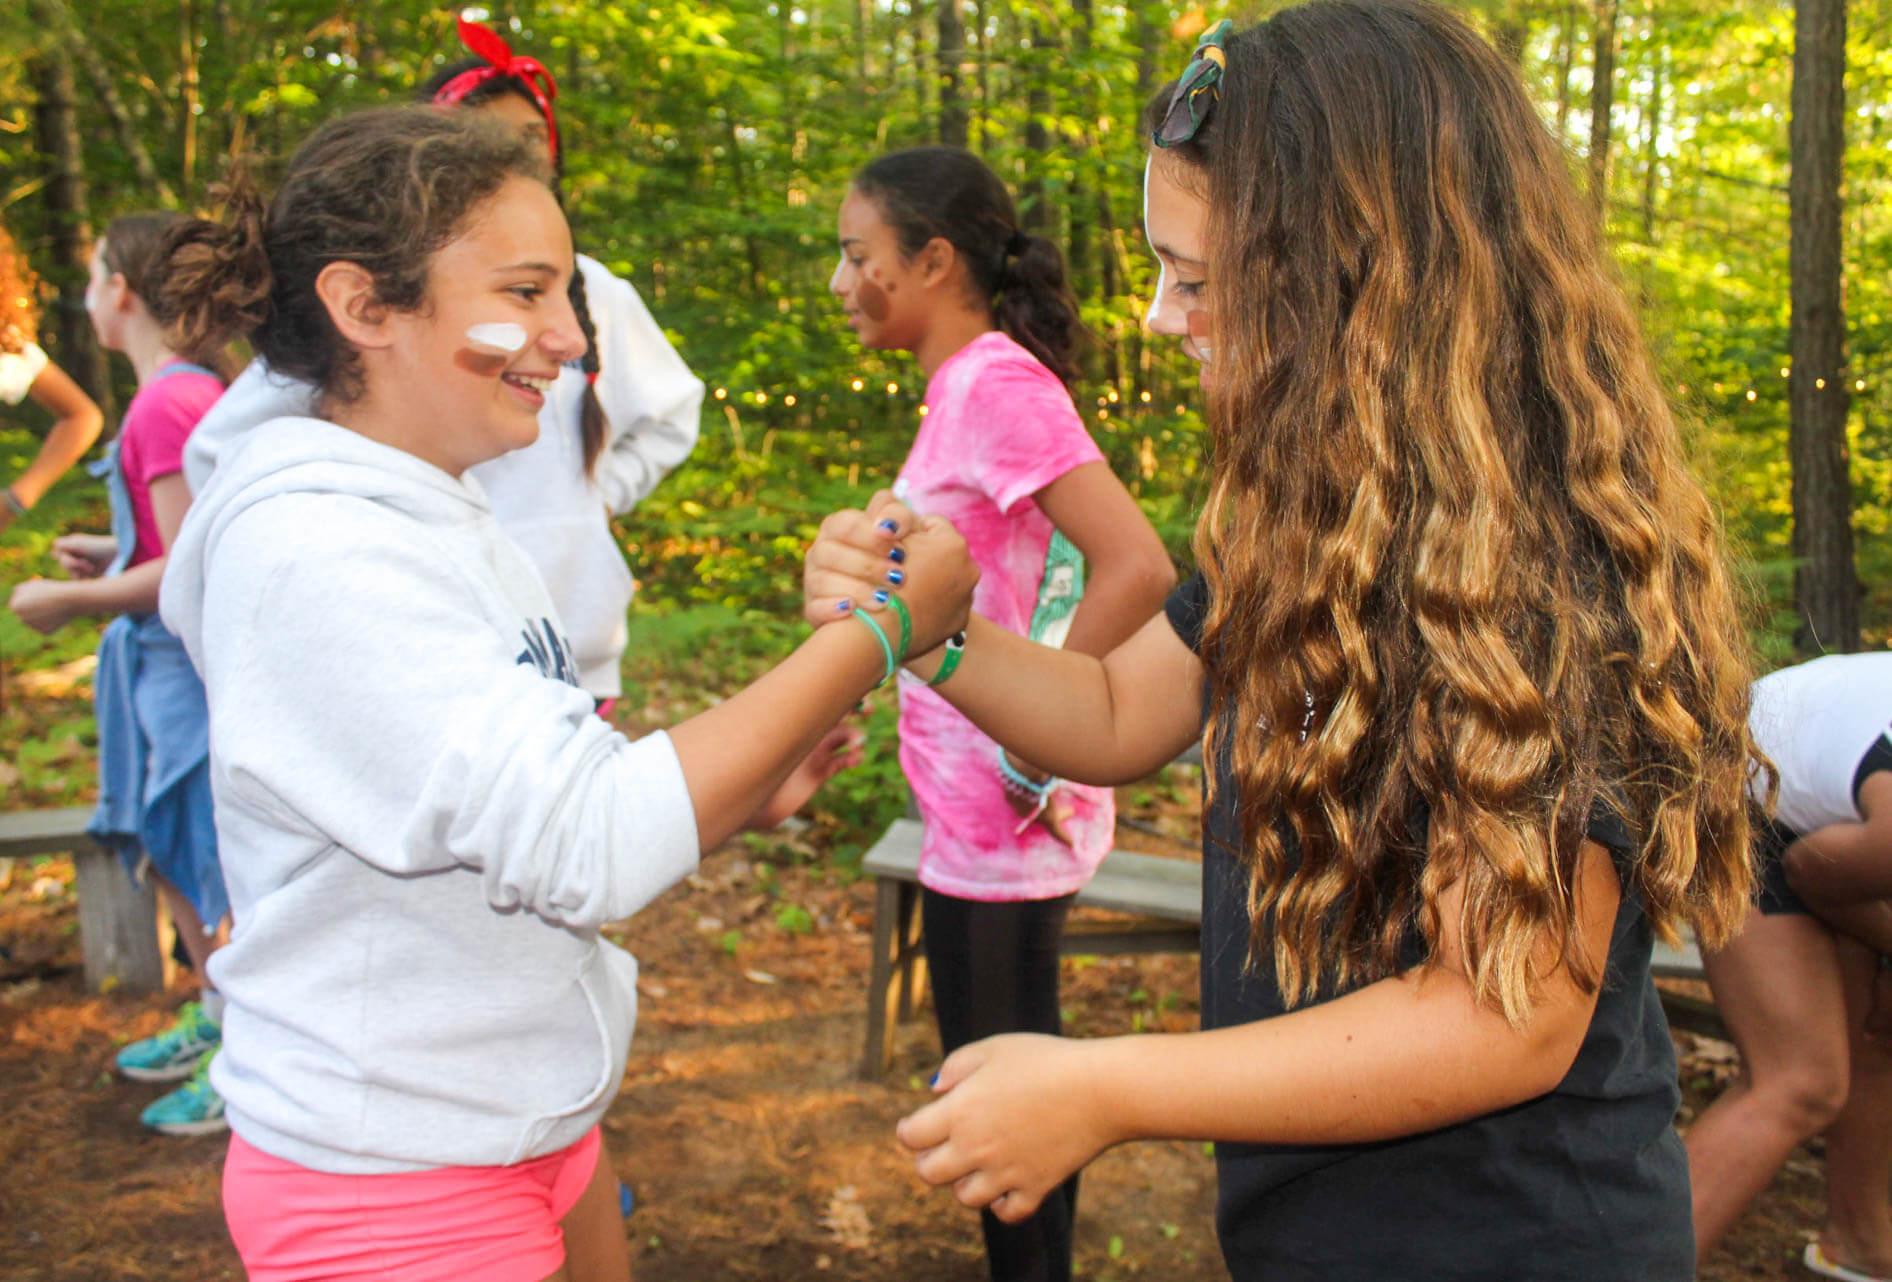 Two campers perform handshake